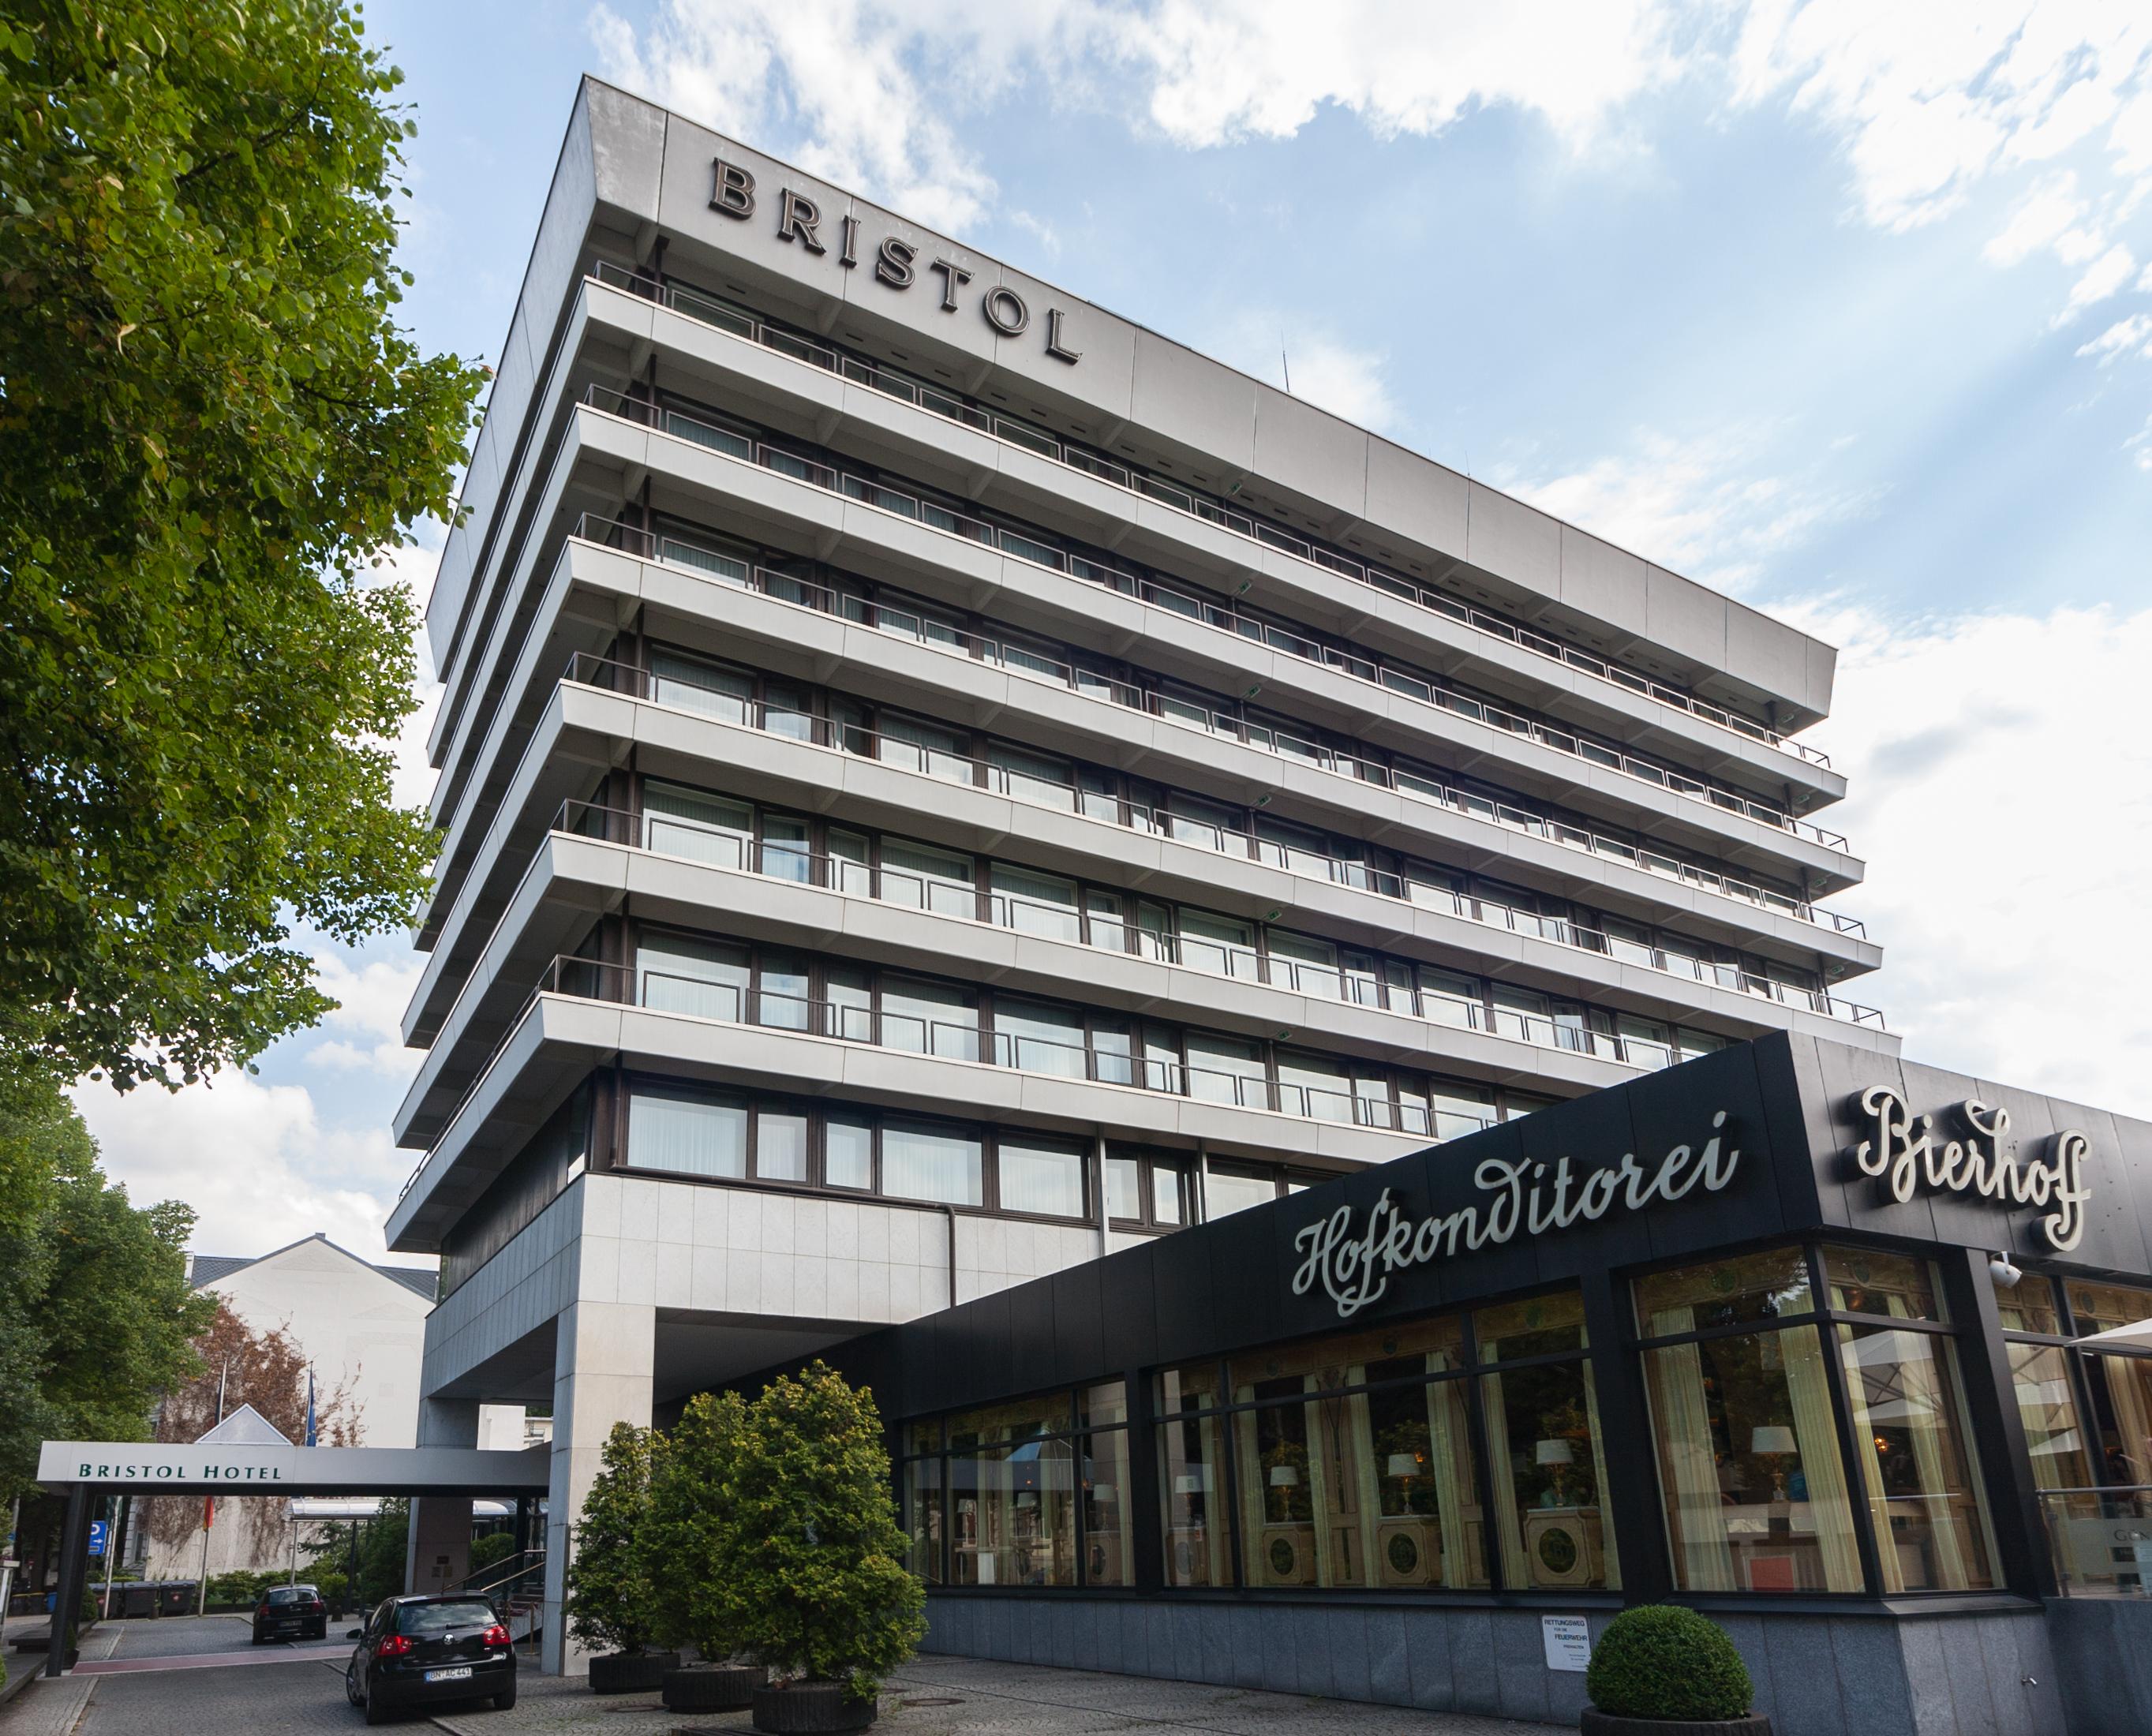 2013-08-27_Hotel_Bristol%2C_Prinz-Albert-Stra%C3%9Fe_2%2C_Bonn_IMG_5227.jpg